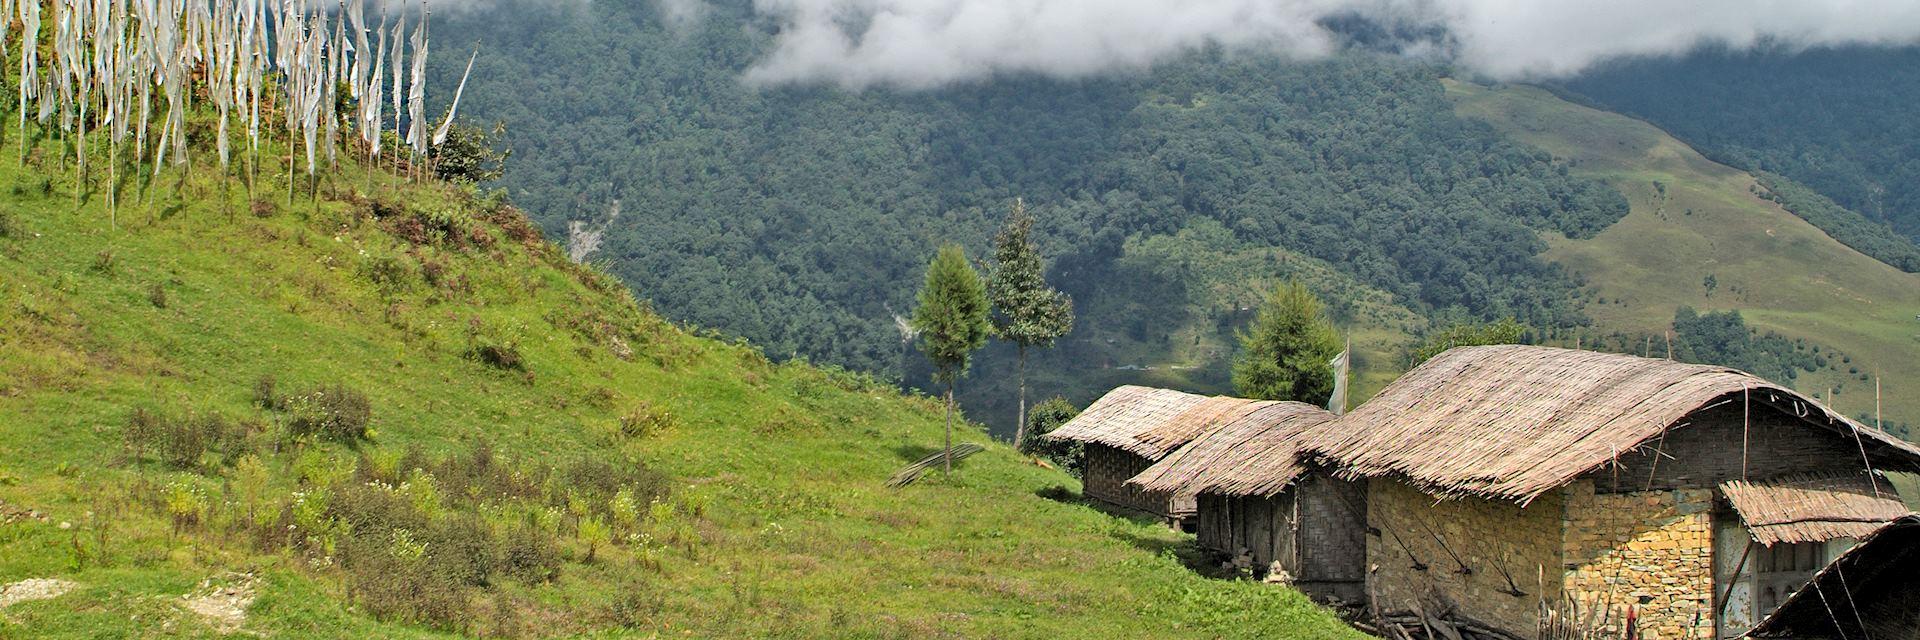 Homes in Trashigang